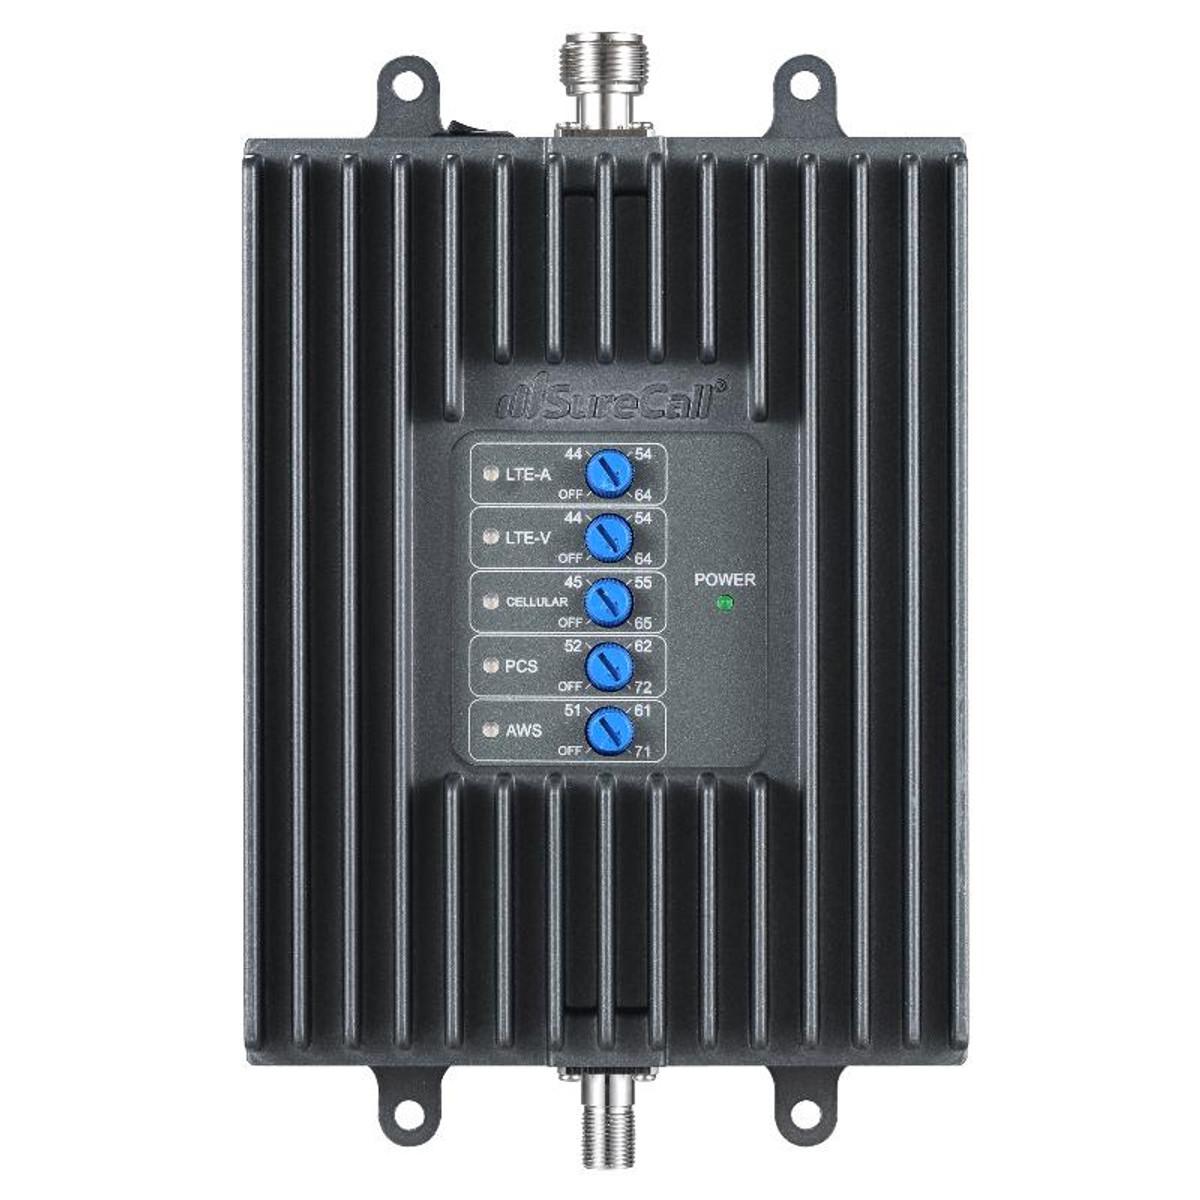 SureCall SureCall Fusion4Home 3.0 Canada Signal Booster with Yagi/Whip Antennas